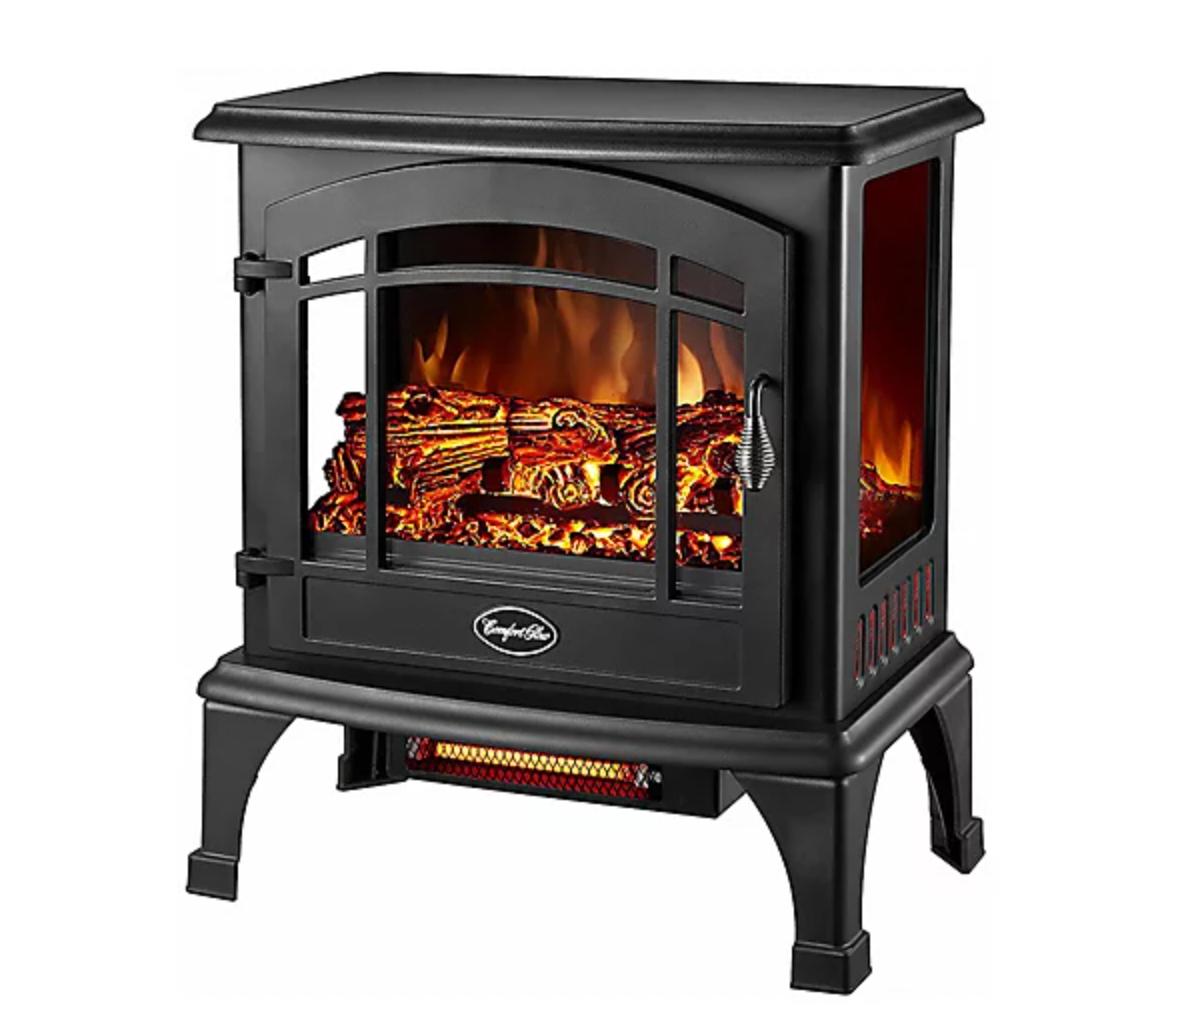 Comfort Glow Indoor Compact Electric PanoramicInfared Heater